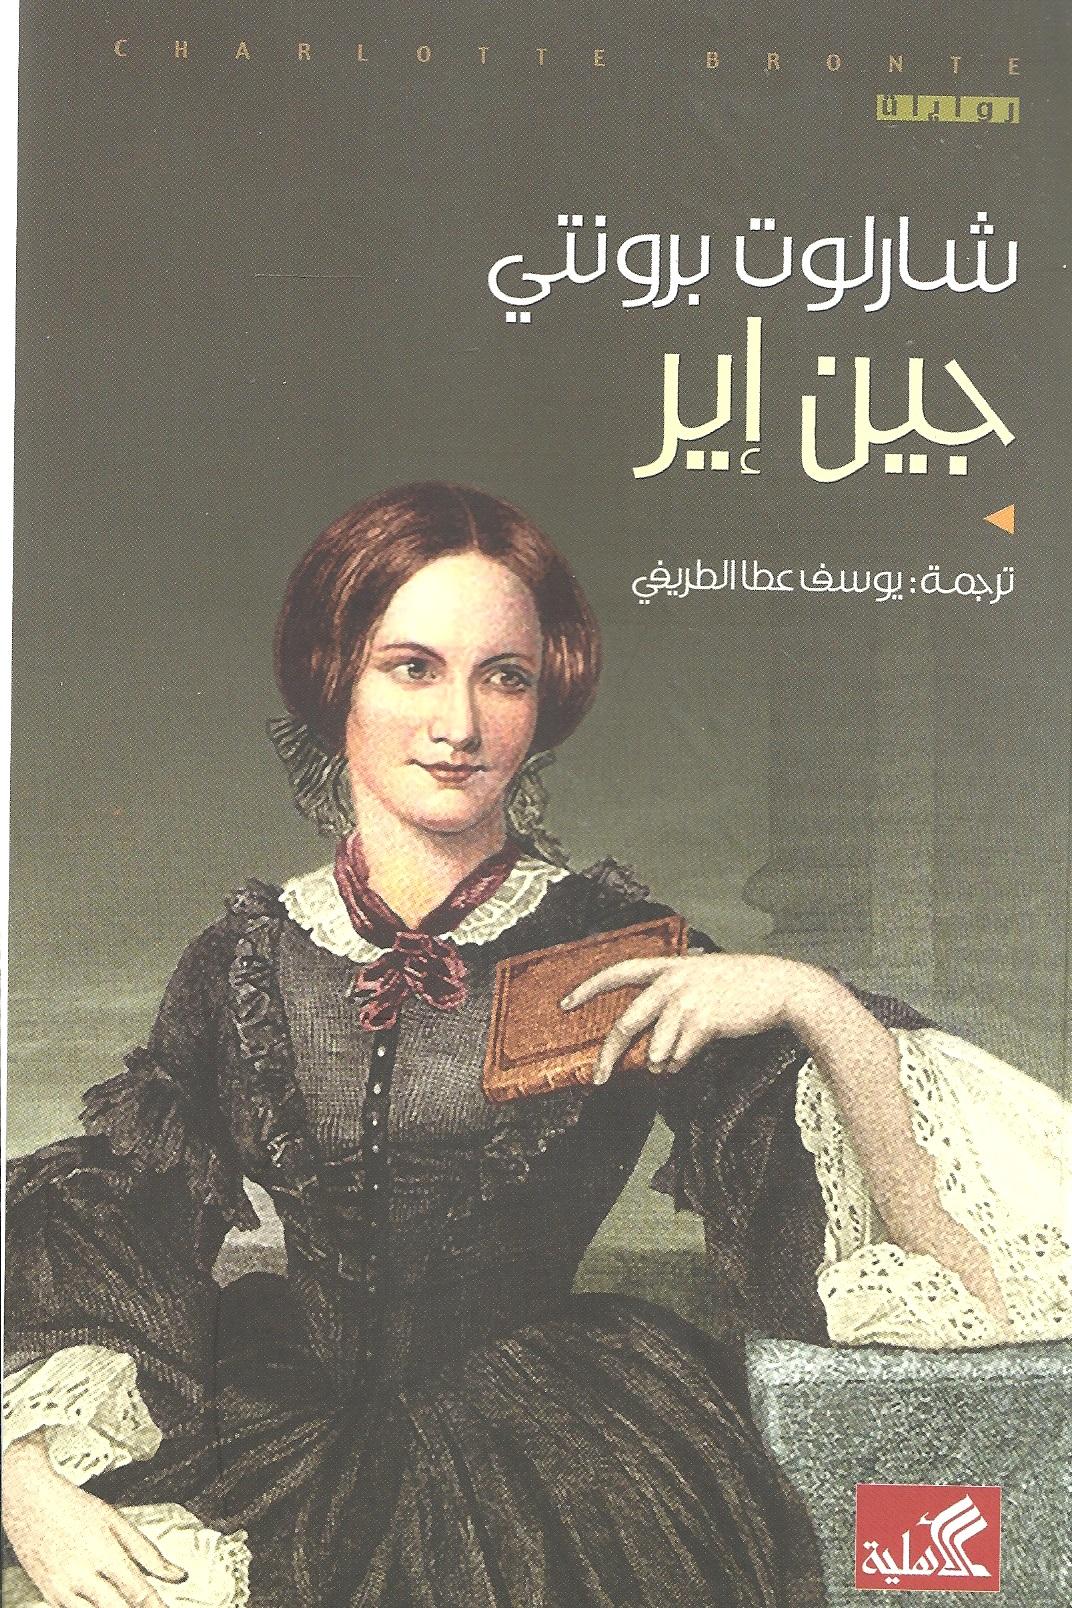 Photo of تحميل روابة جين آير PDF